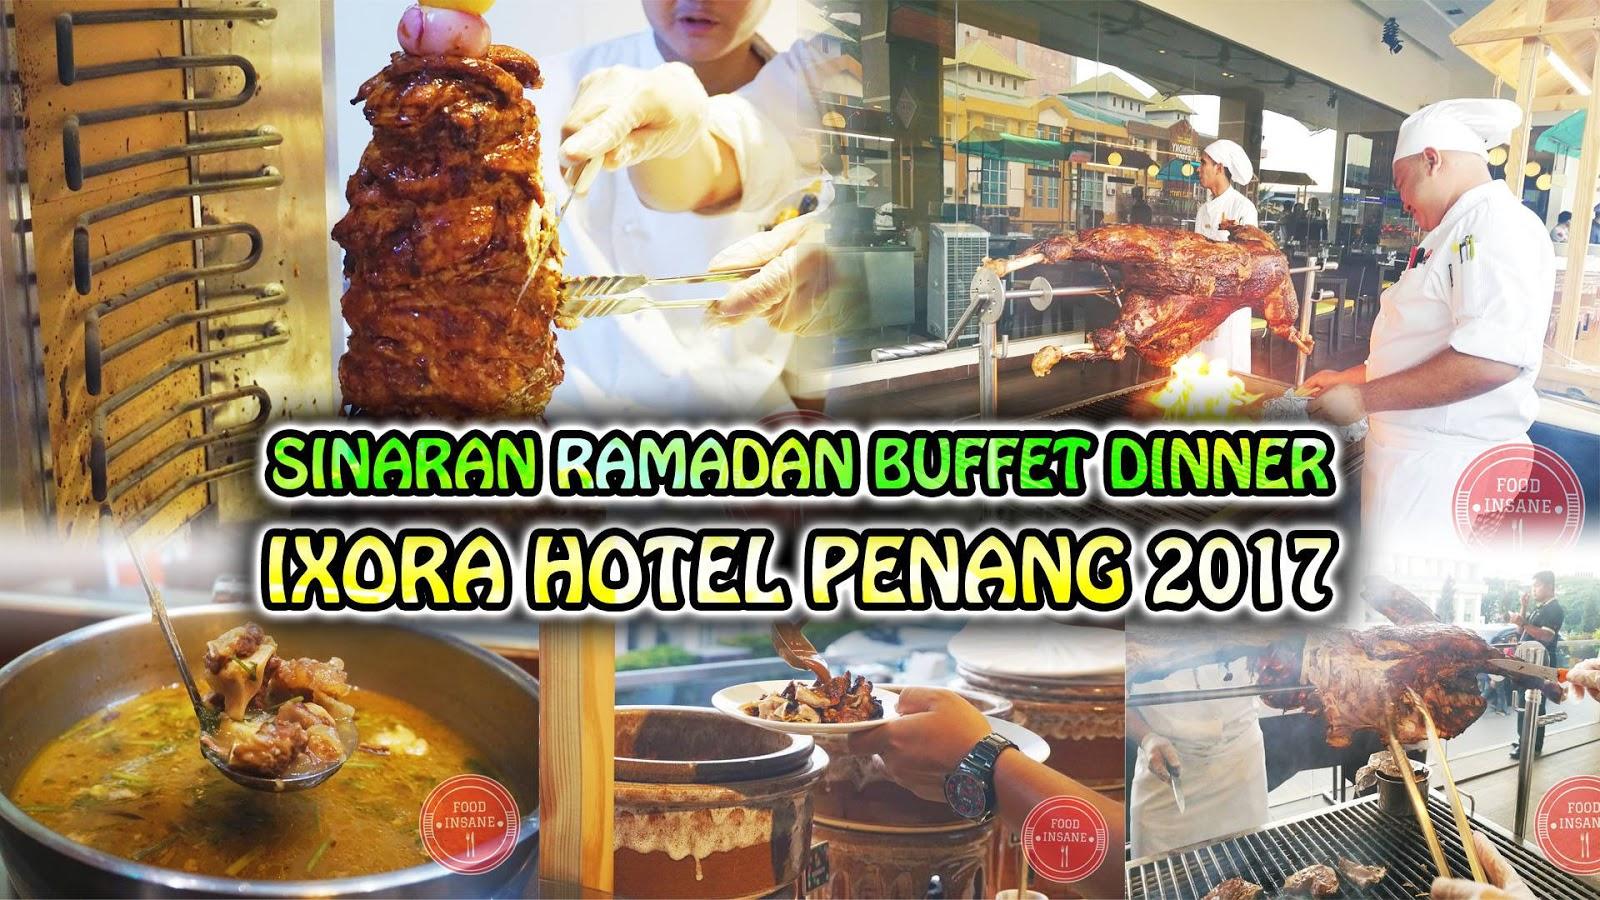 Food Insane Sinaran Ramadan Buffet Dinner The Straits